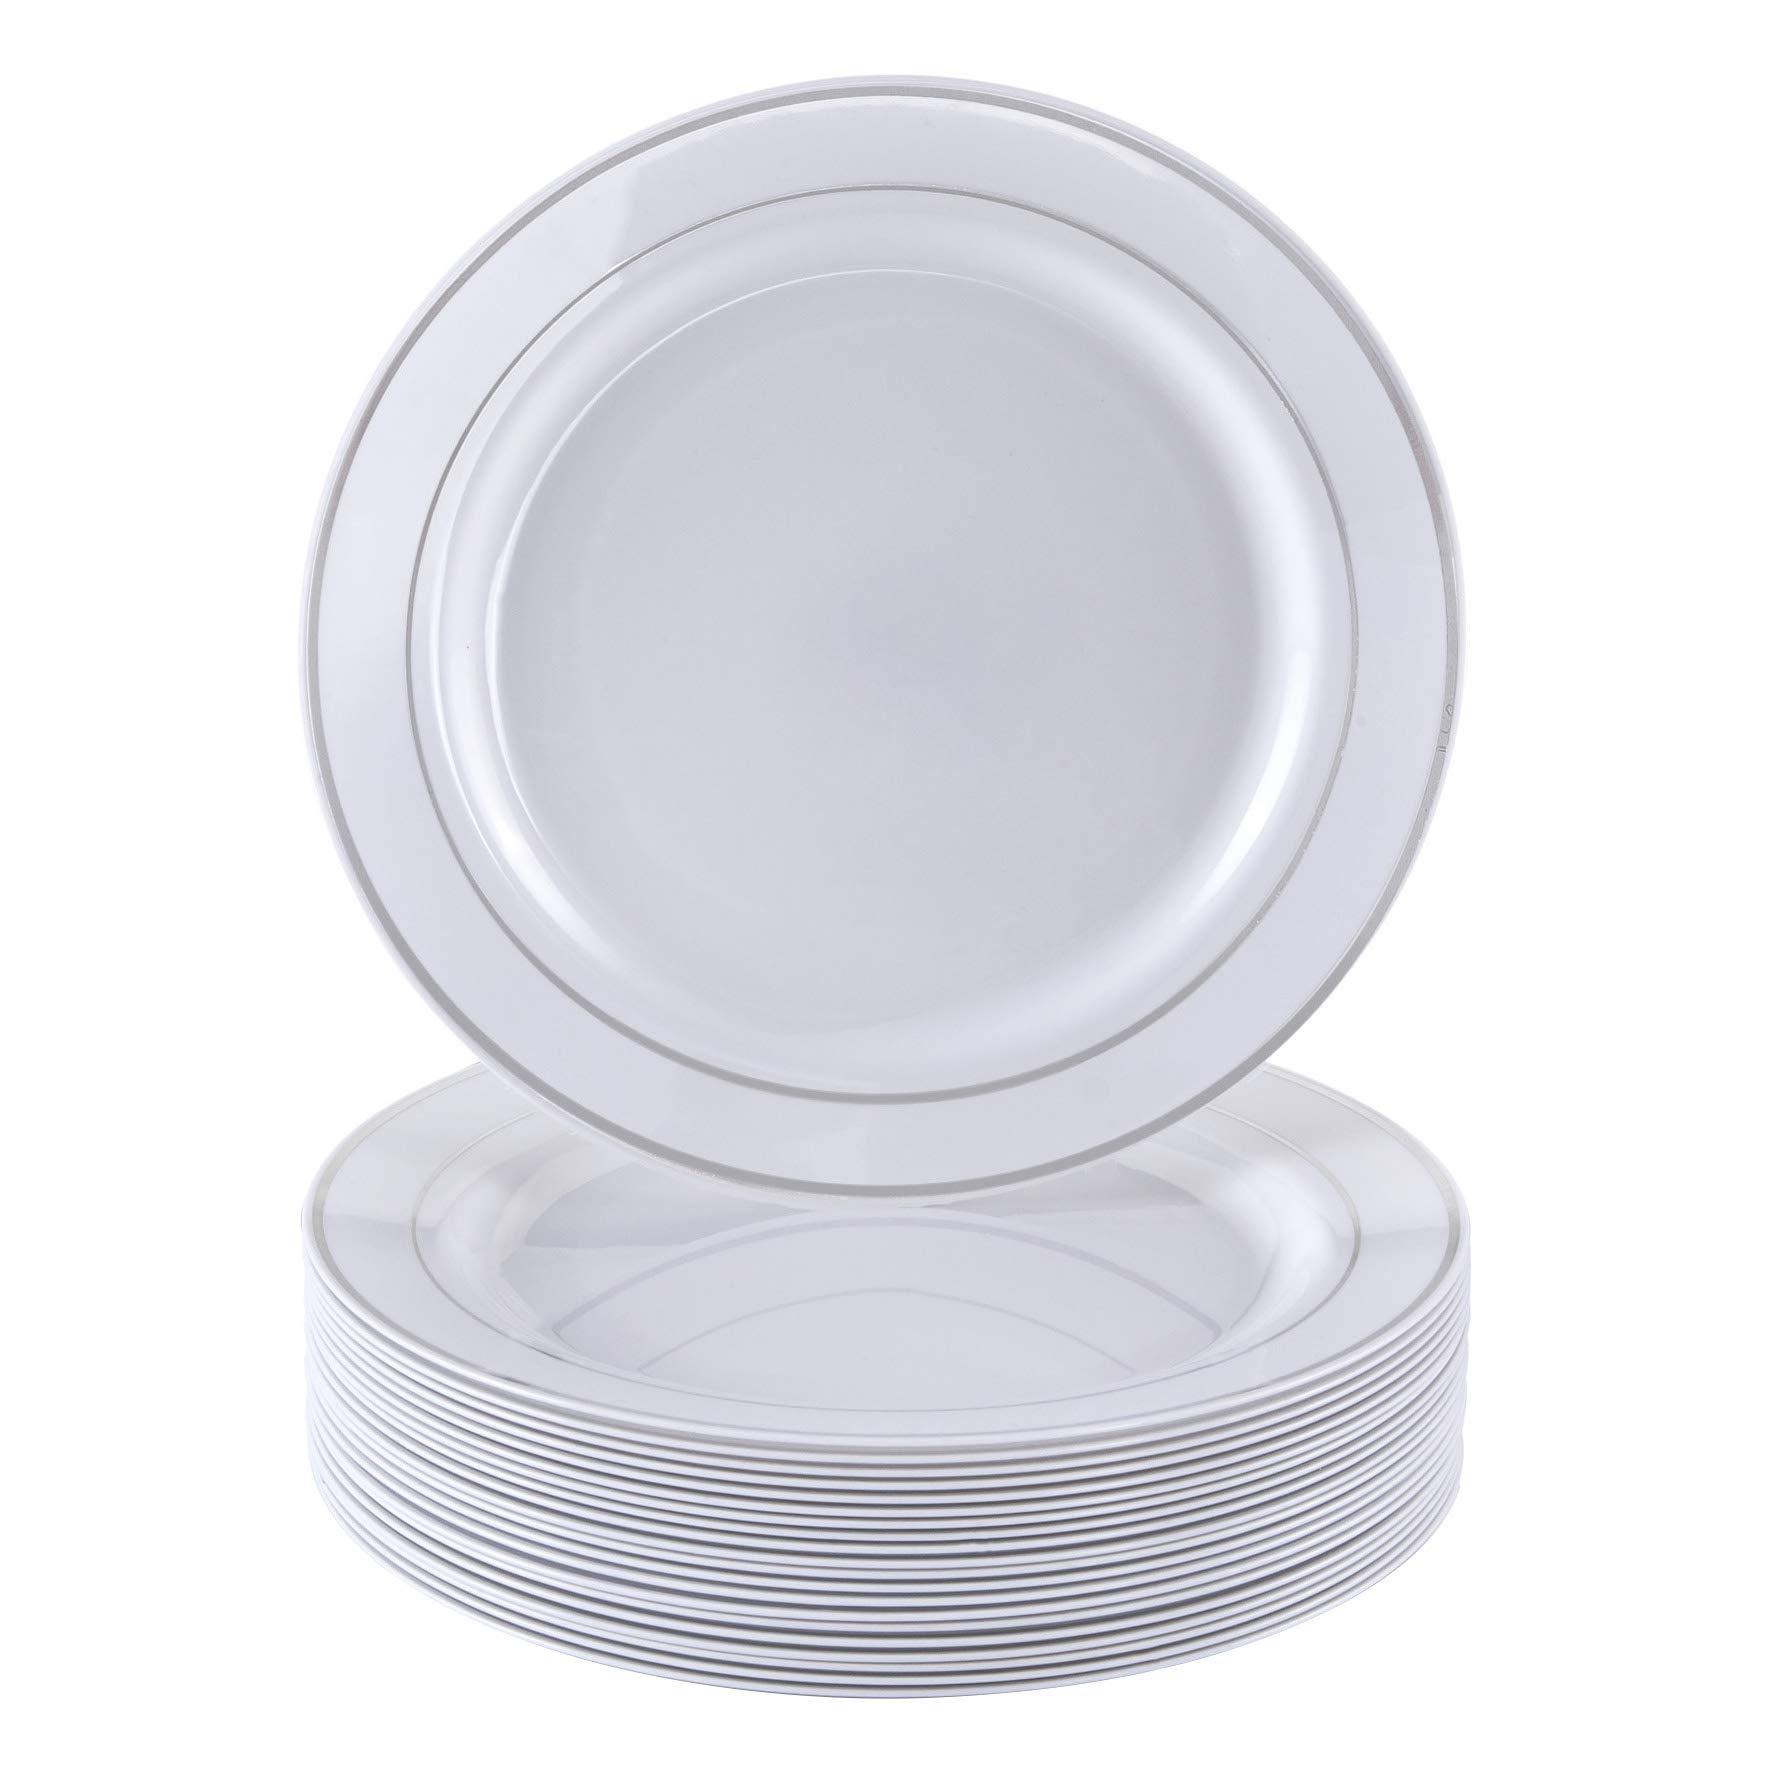 "DISPOSABLE DINNERWARE SET, 20 Plastic Dessert Plates (Silver Glare, 7.5"")"